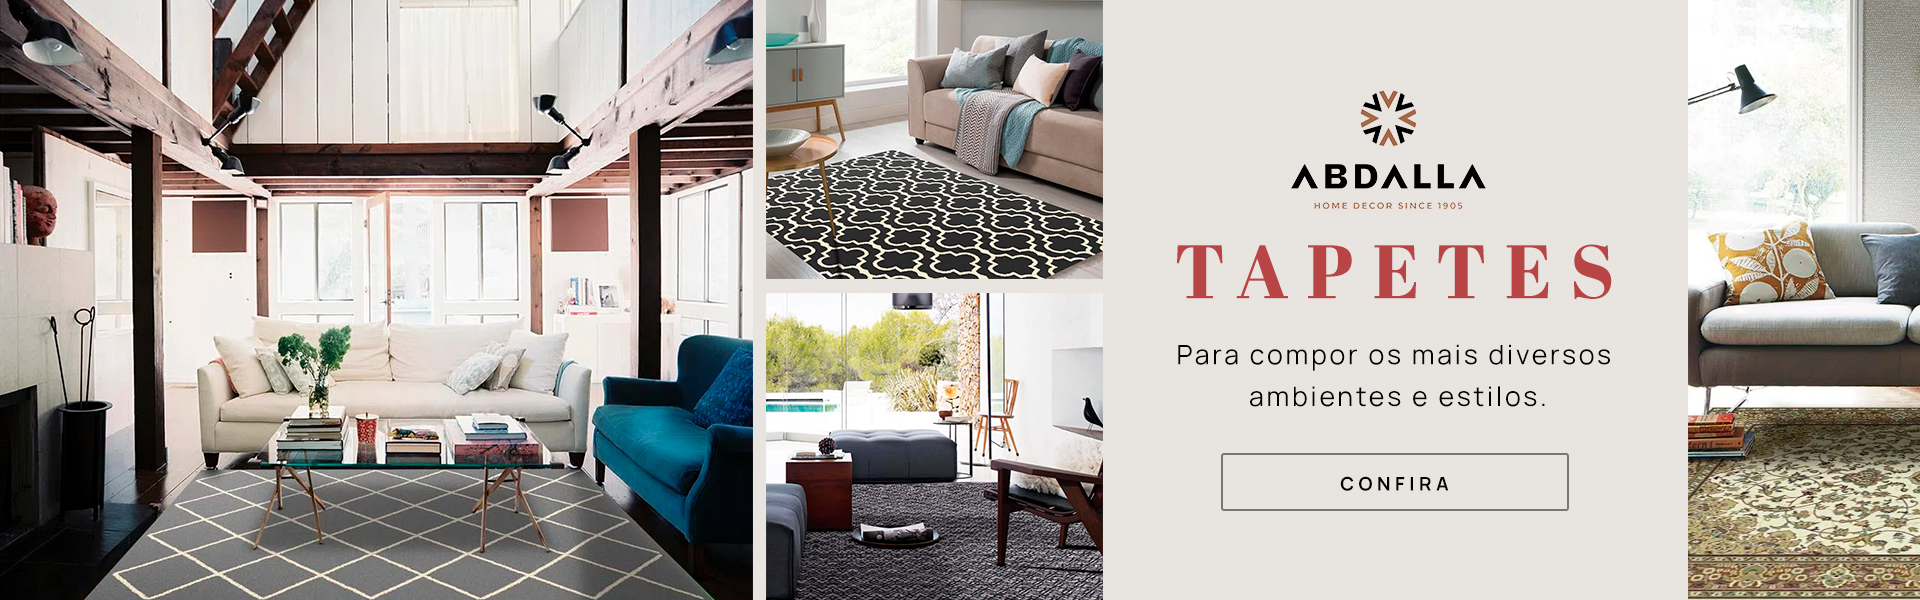 Banner - Tapetes